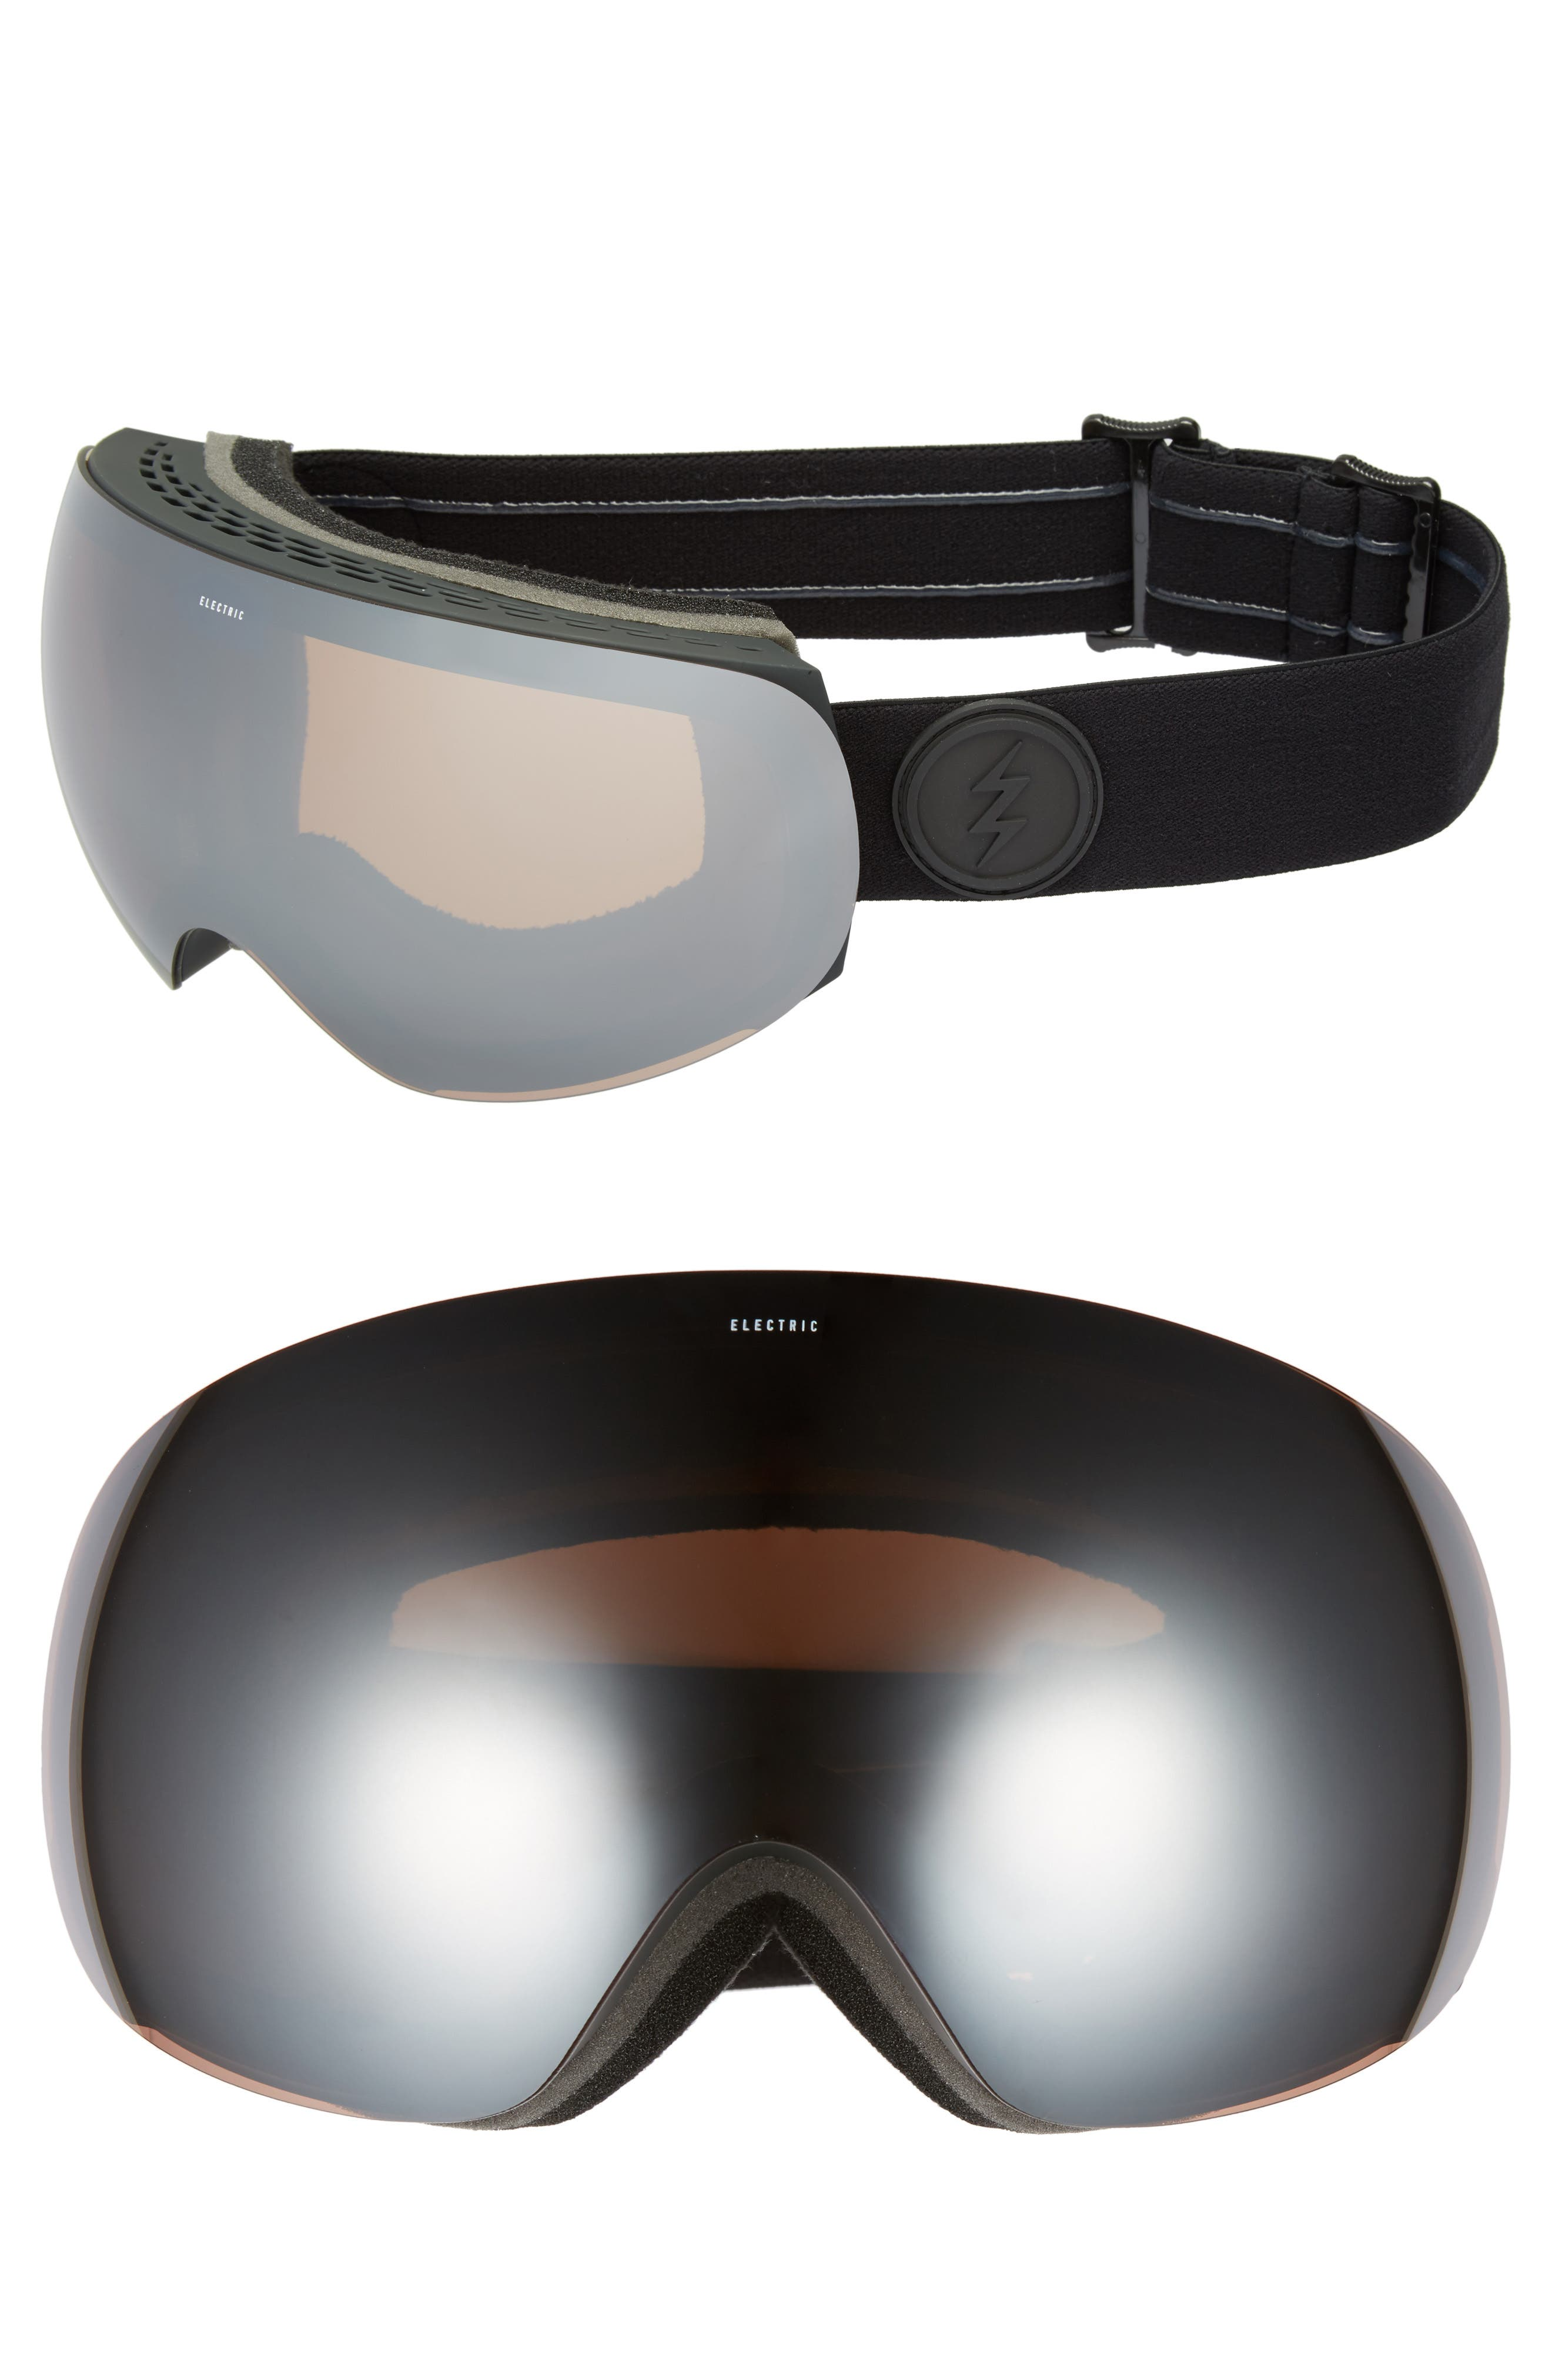 EG3 Snow Goggles,                             Main thumbnail 1, color,                             Matte Black/ Silver Chrome